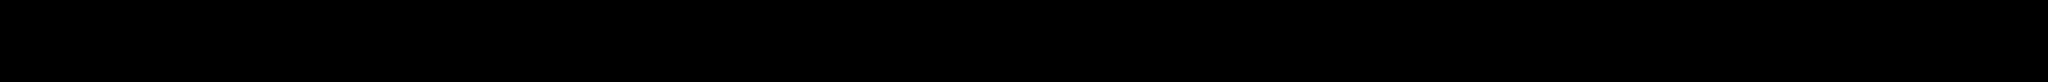 MAMMOOTH Κάλυμμα χώρου αποσκευών / χώρου φόρτωσης